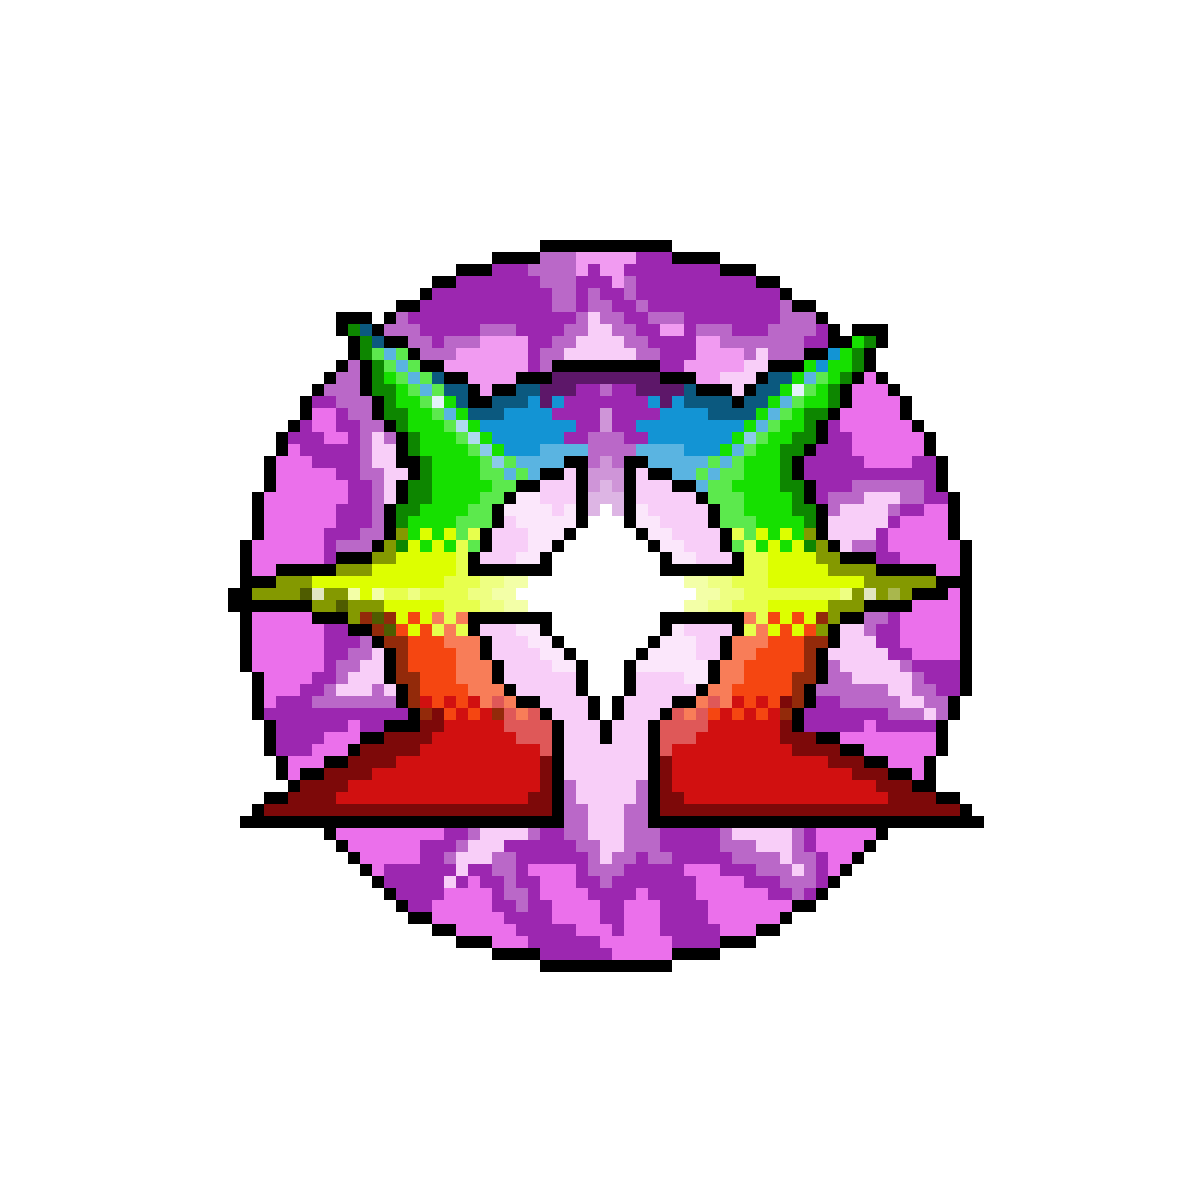 Melenia orb (prototype) by Terraclipse